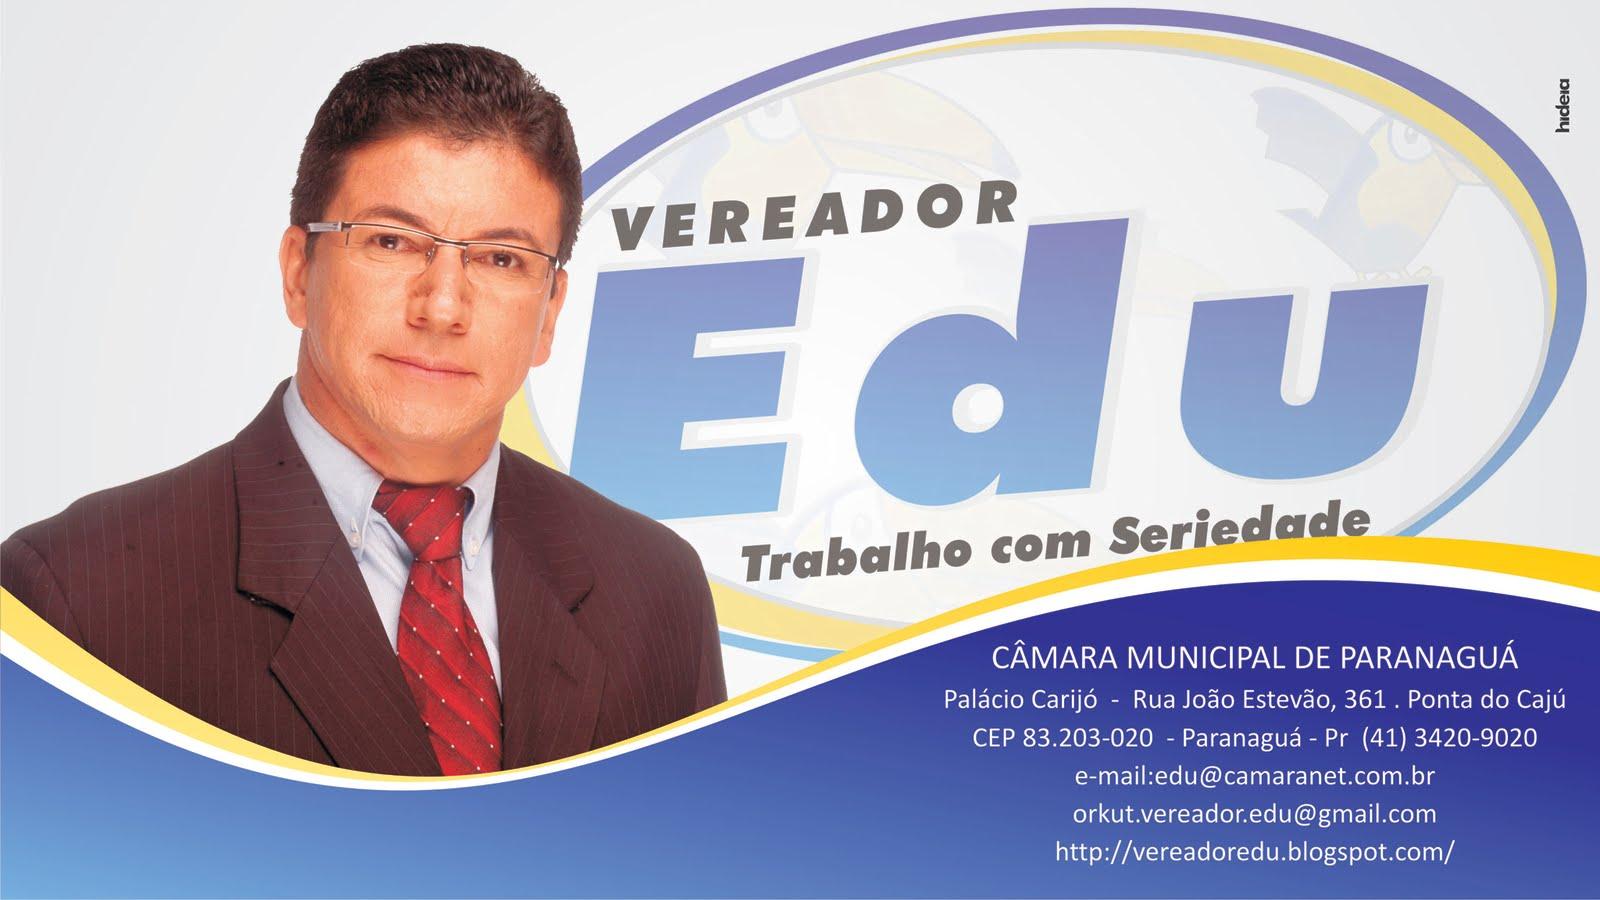 Vereador Edu - Paranaguá - Pr.